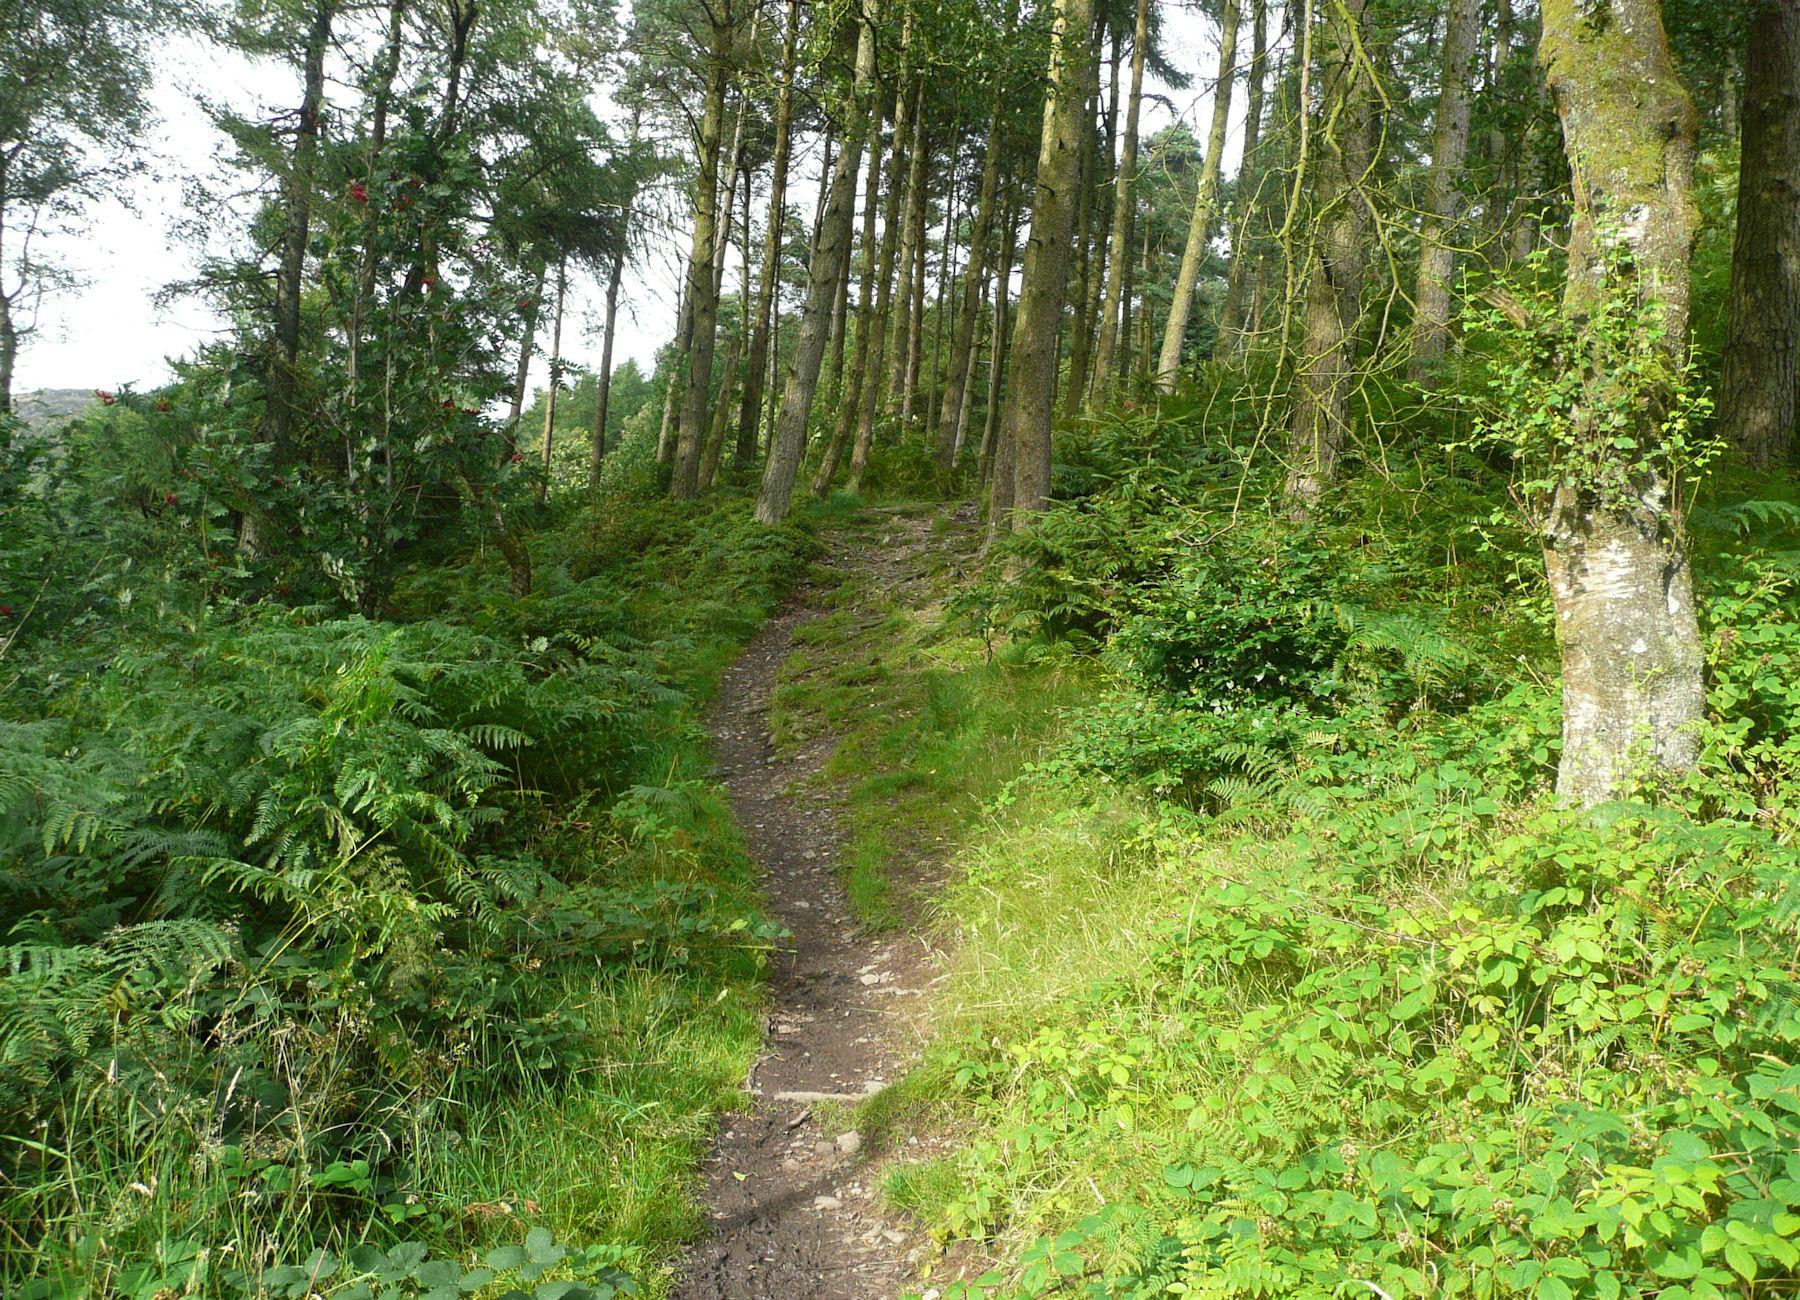 Gummer's How path